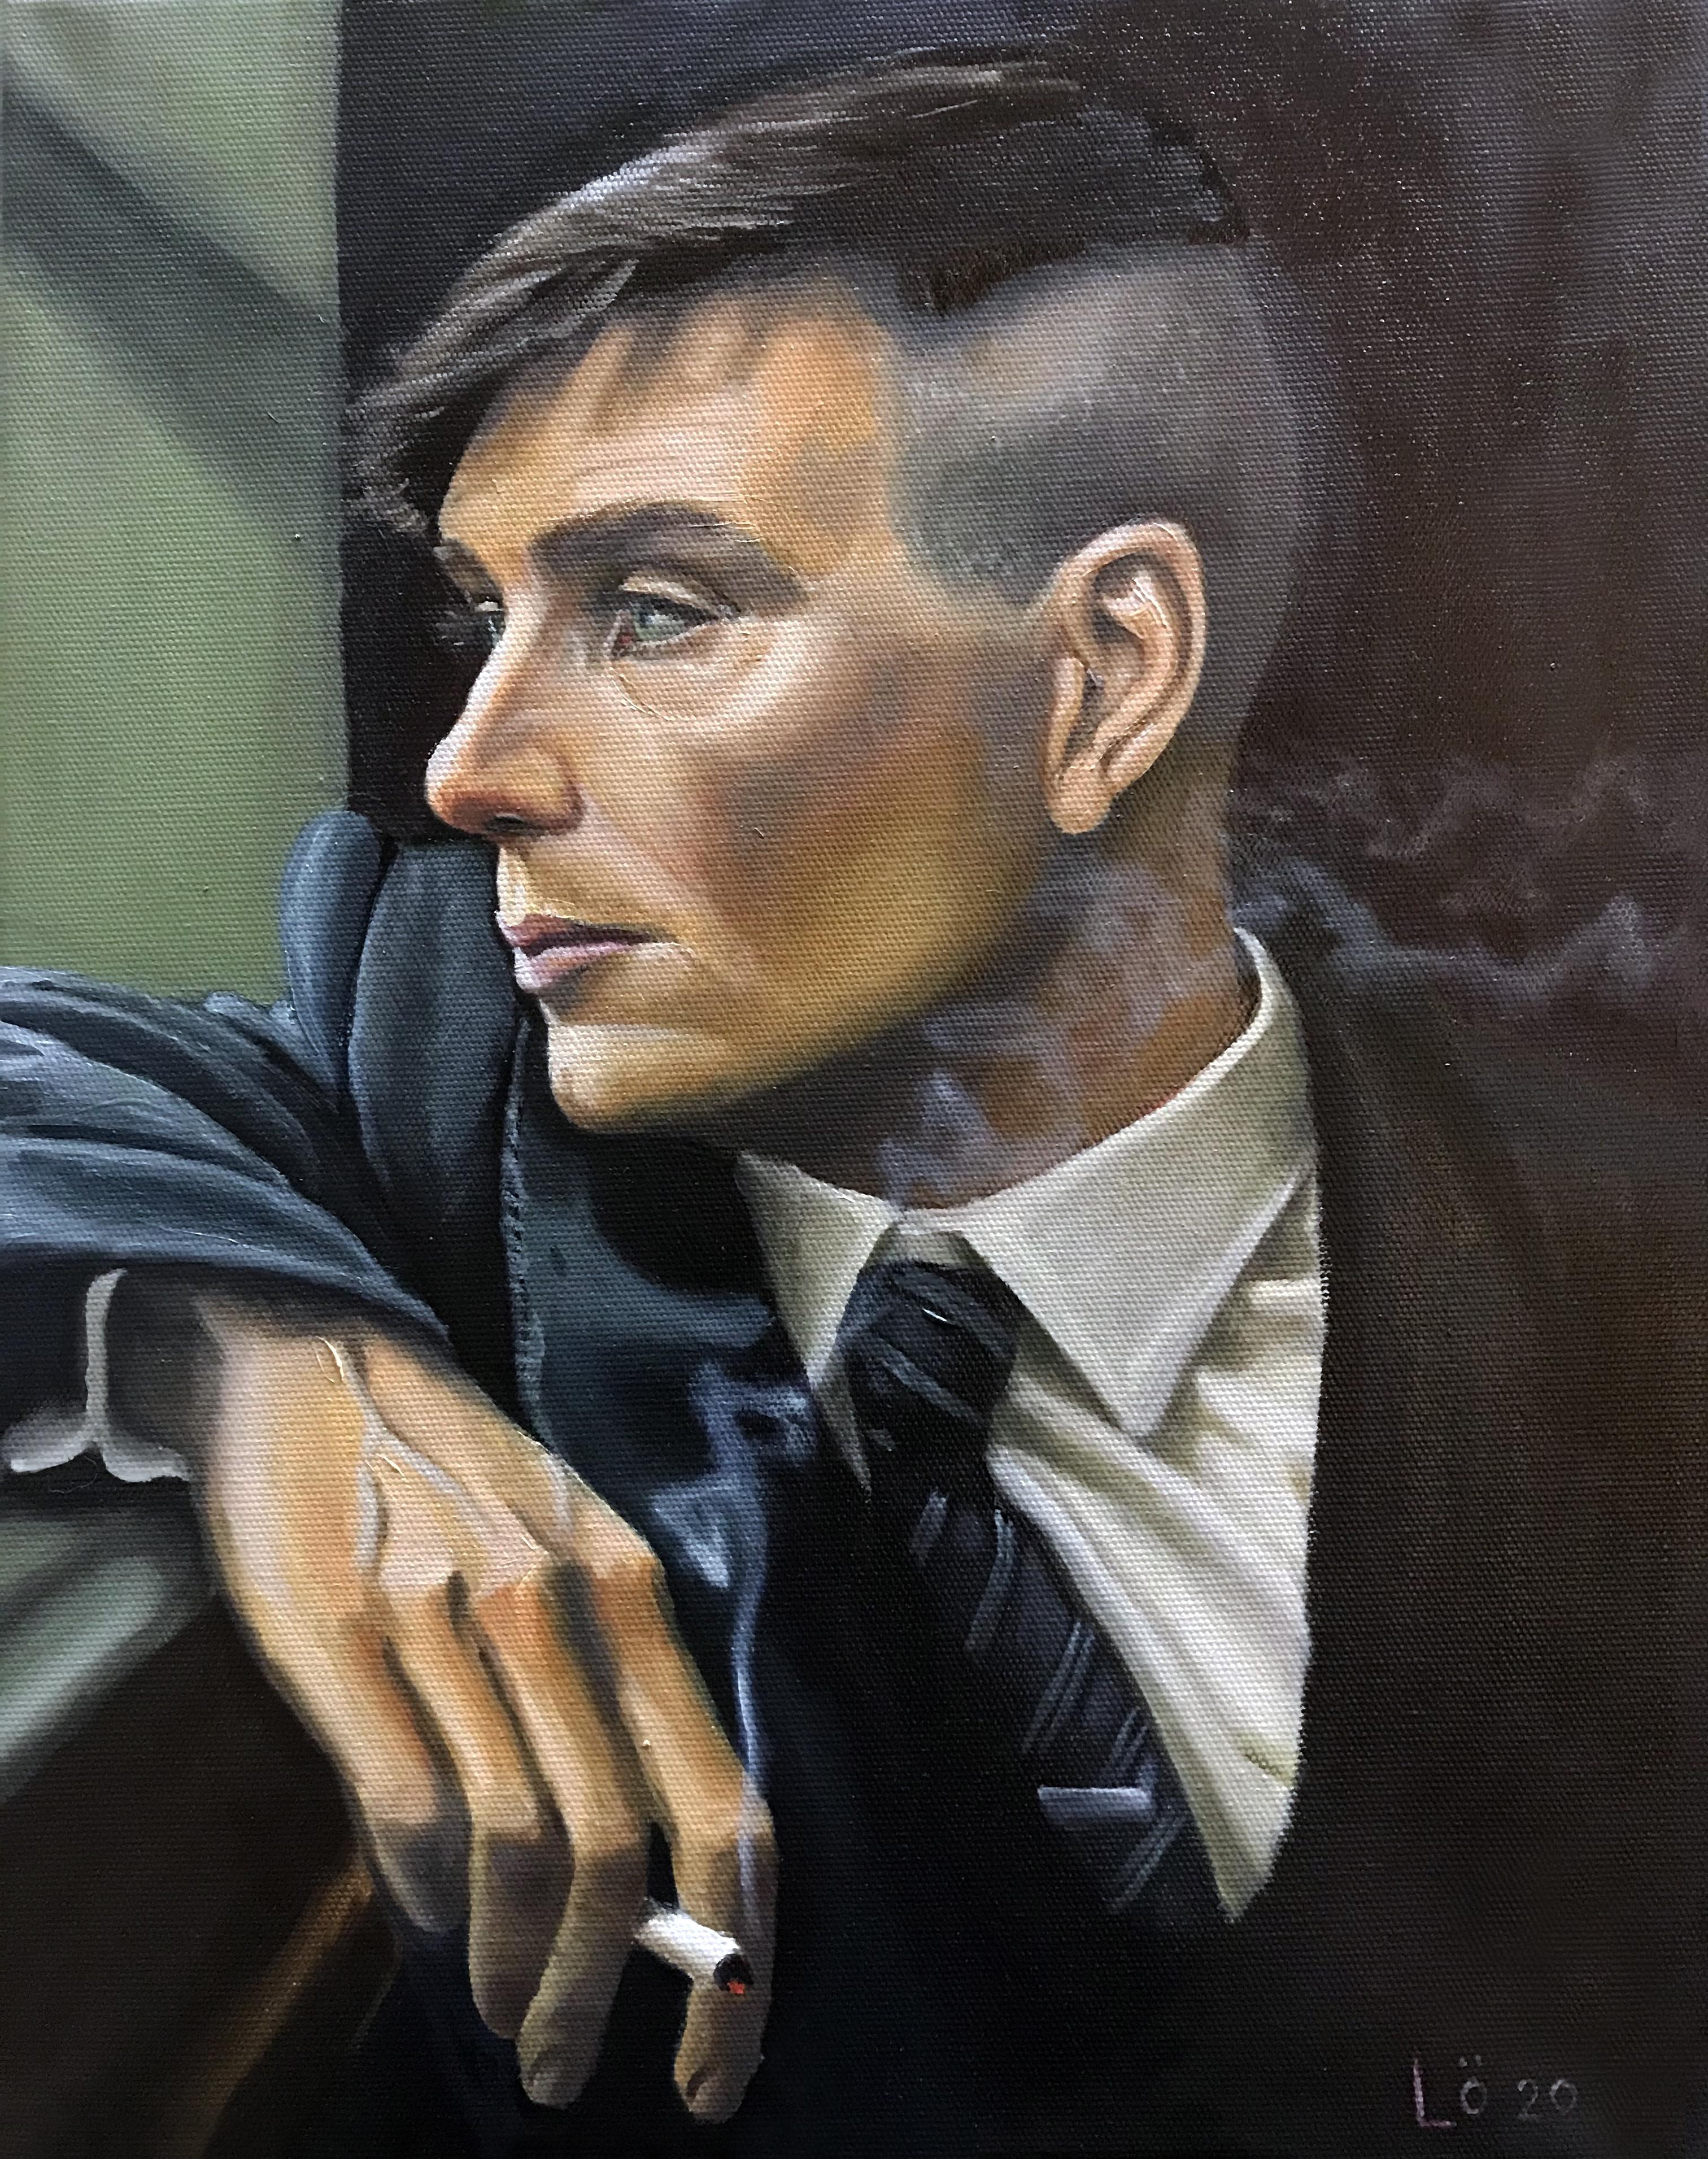 Портрет актёра Киллиана Мёрфи